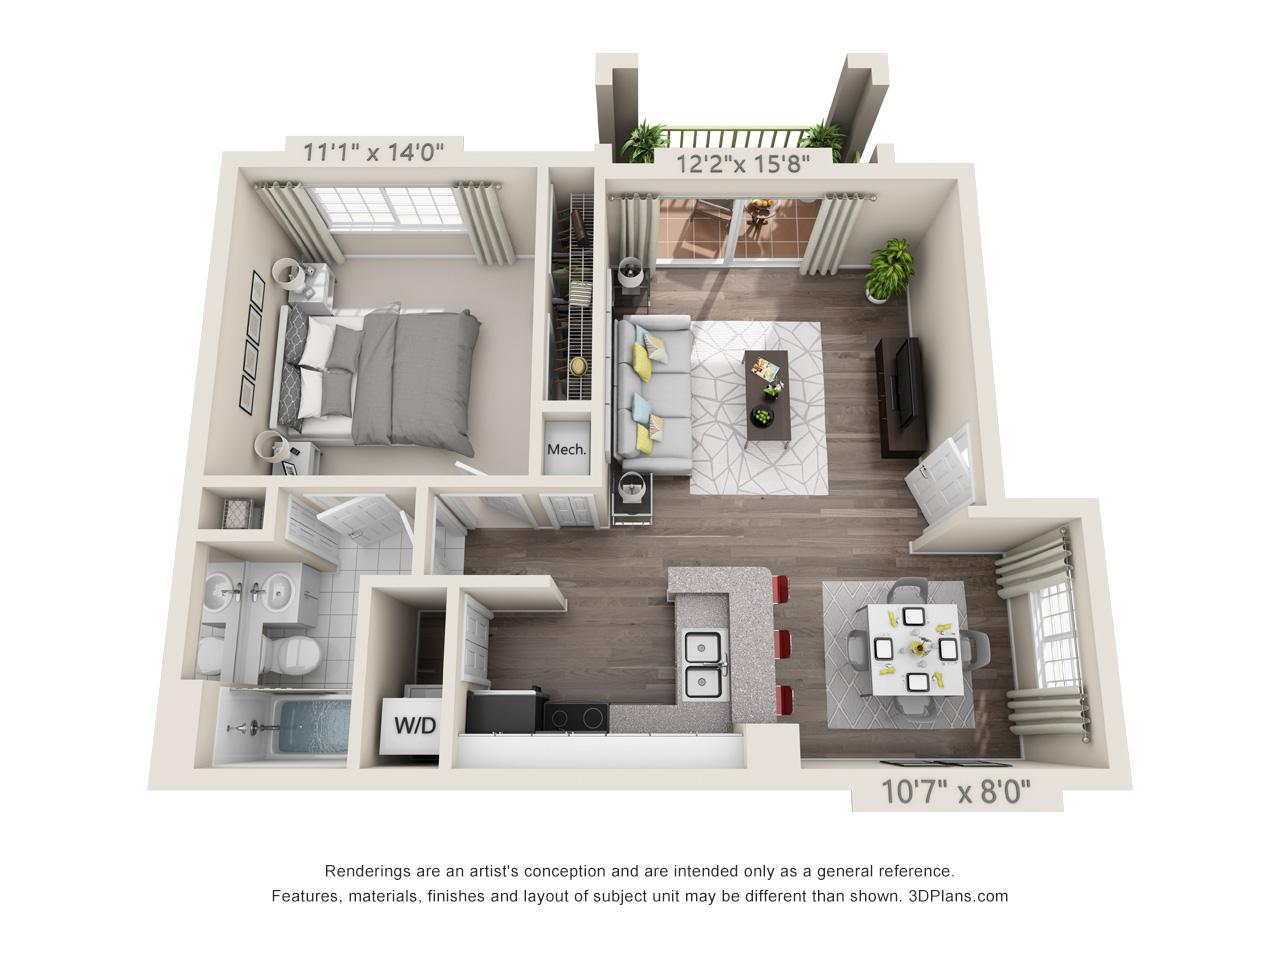 pompano beach apartments